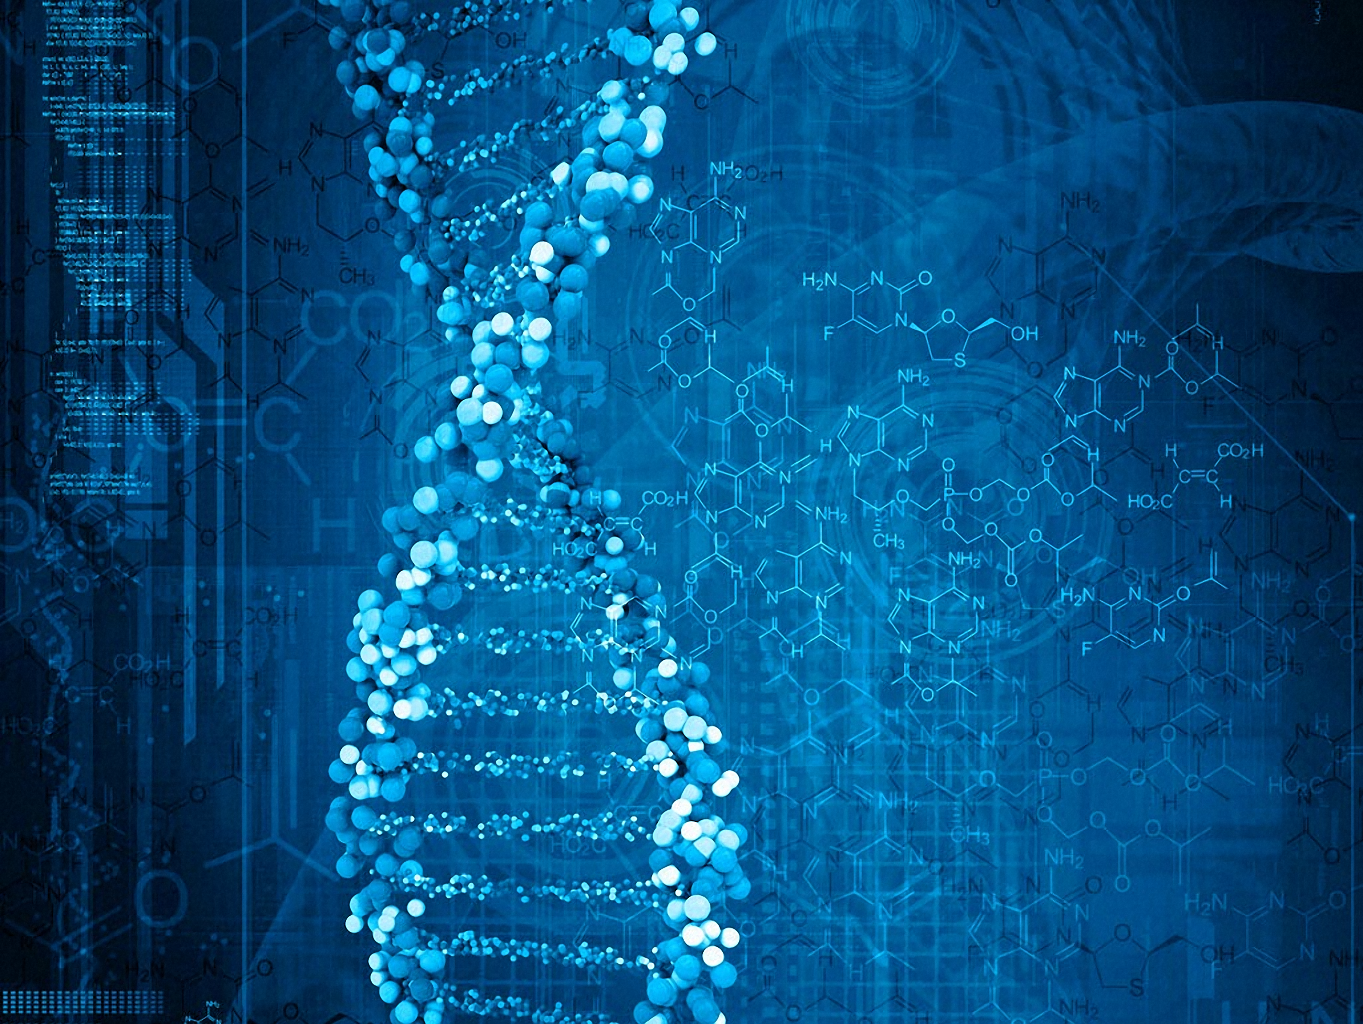 DNA Wallpaper Cracksoldiers Blog 1363x1024